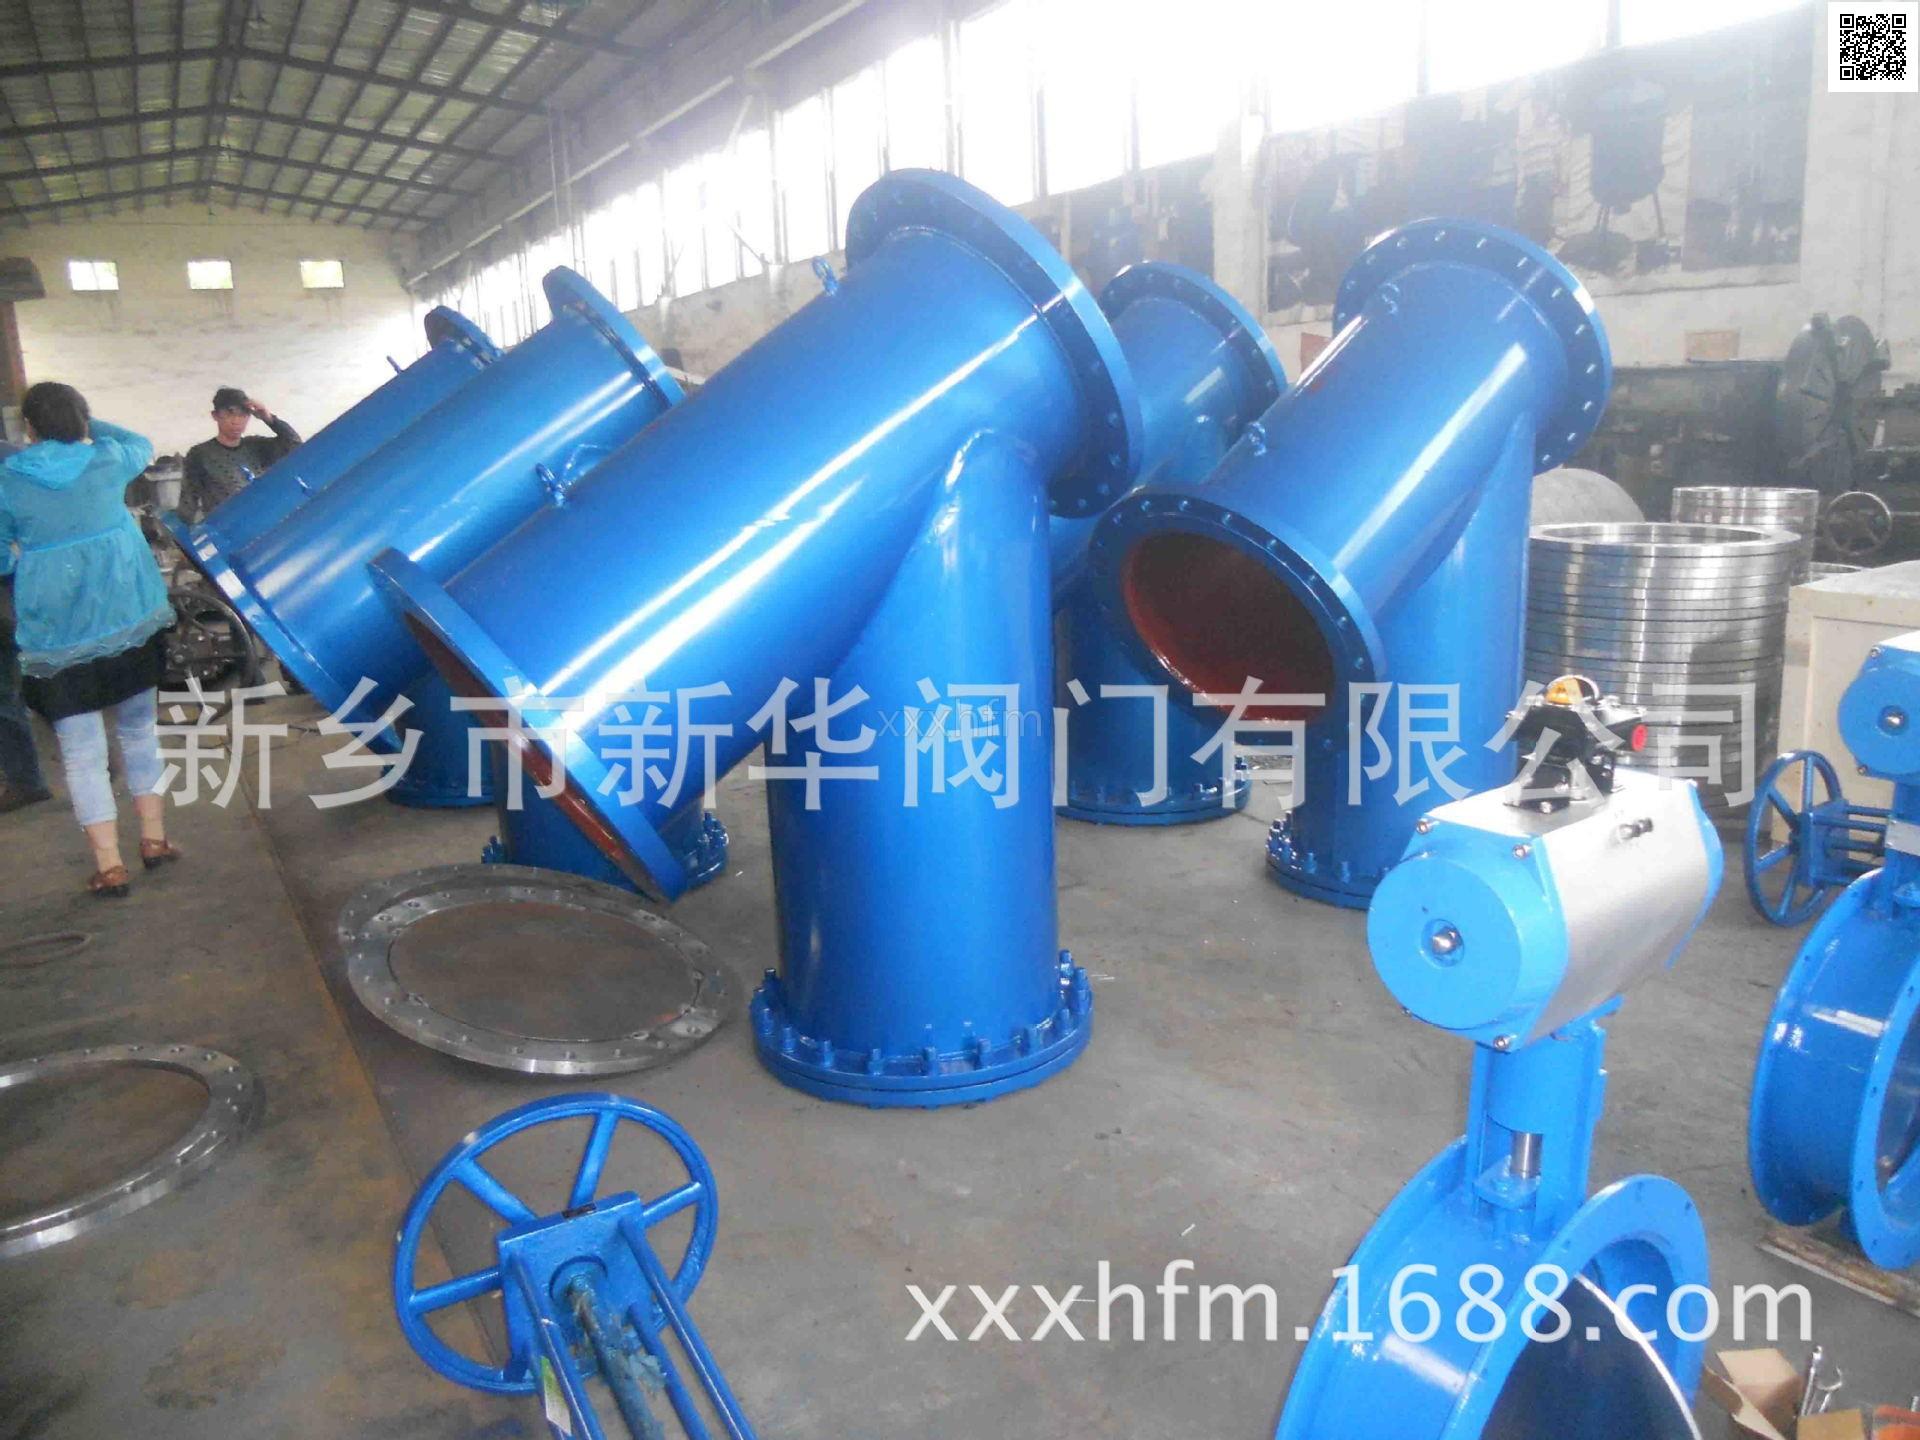 ���,yb�9�yh�y�_专业定做y型过滤器 大口径高效钢制滤水器 污水管道除污器